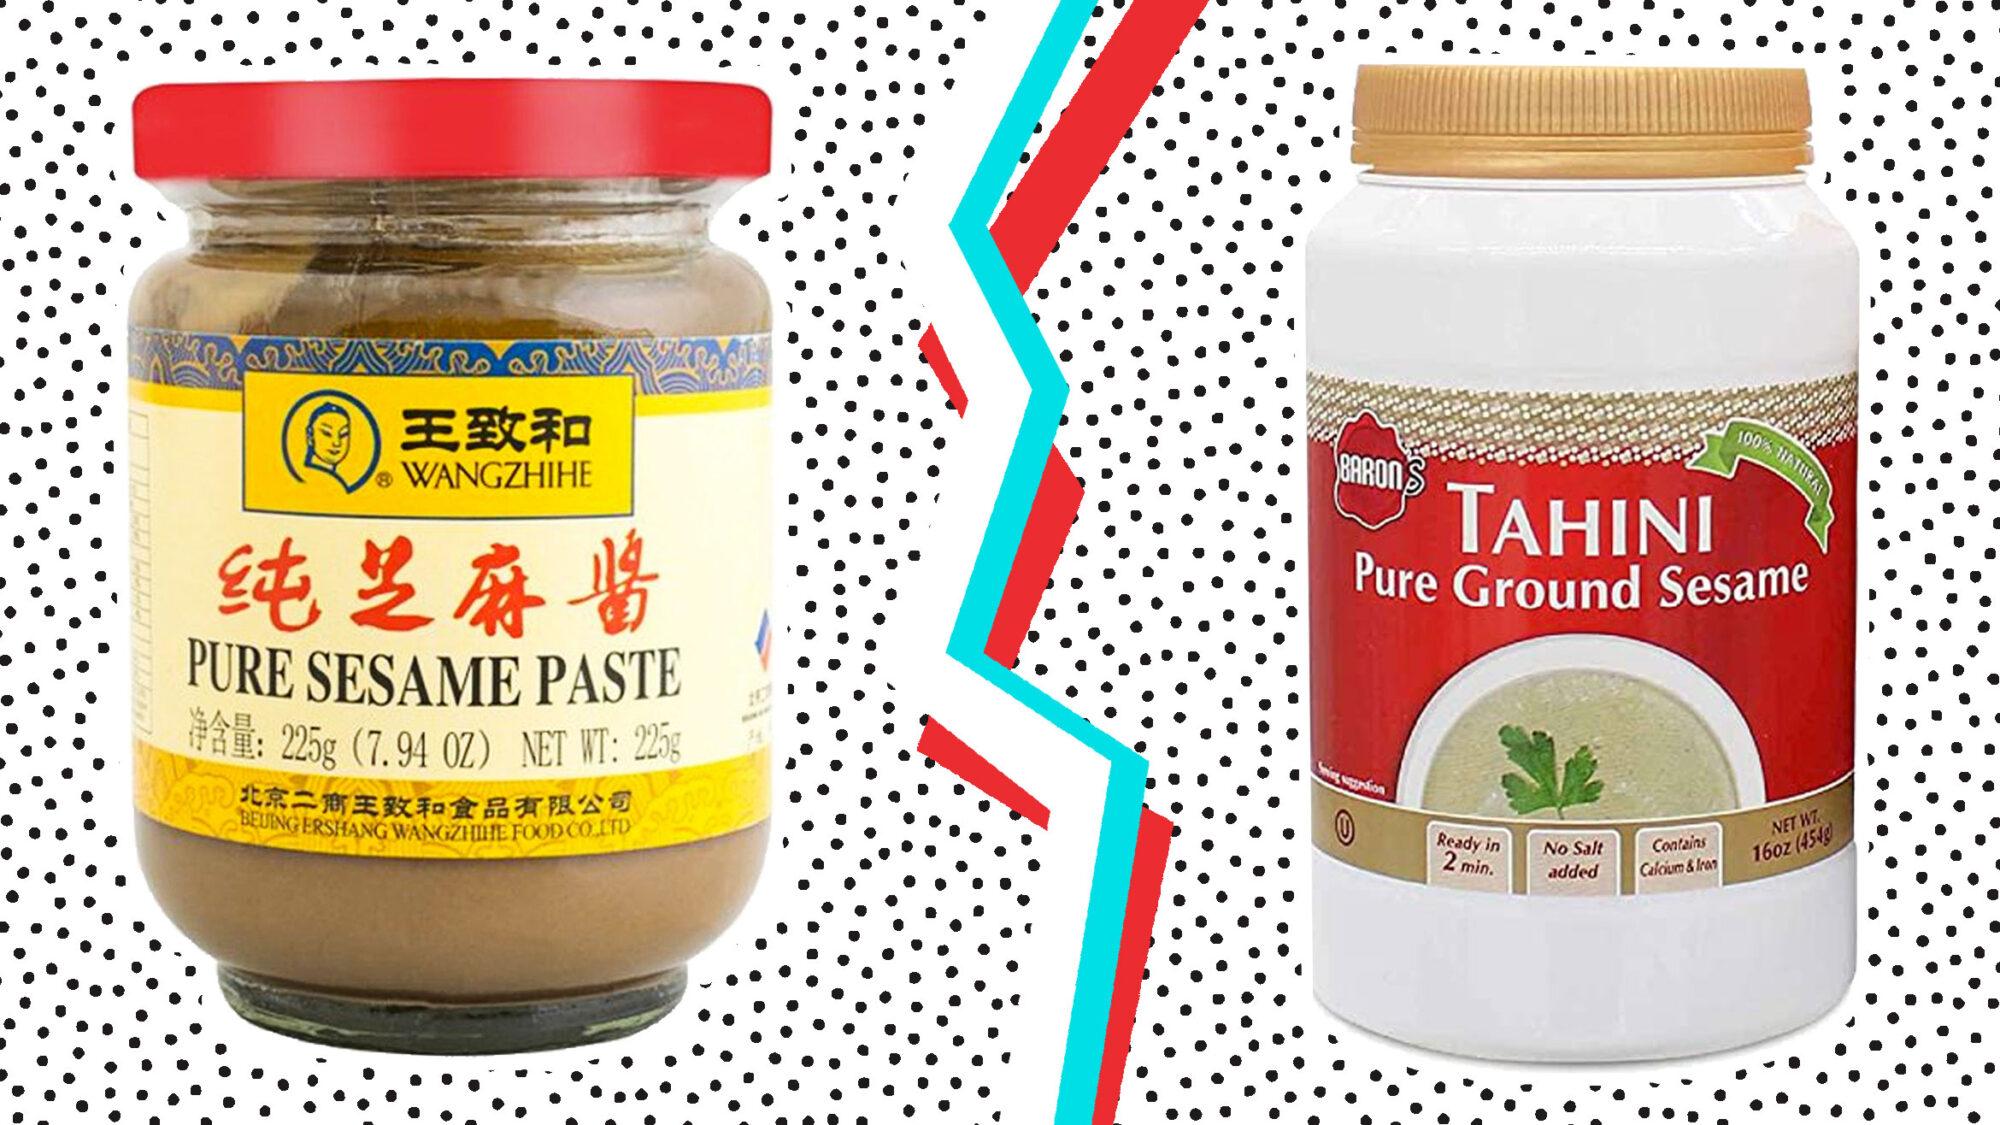 Article-Chinese-Sesame-Paste-Tahini